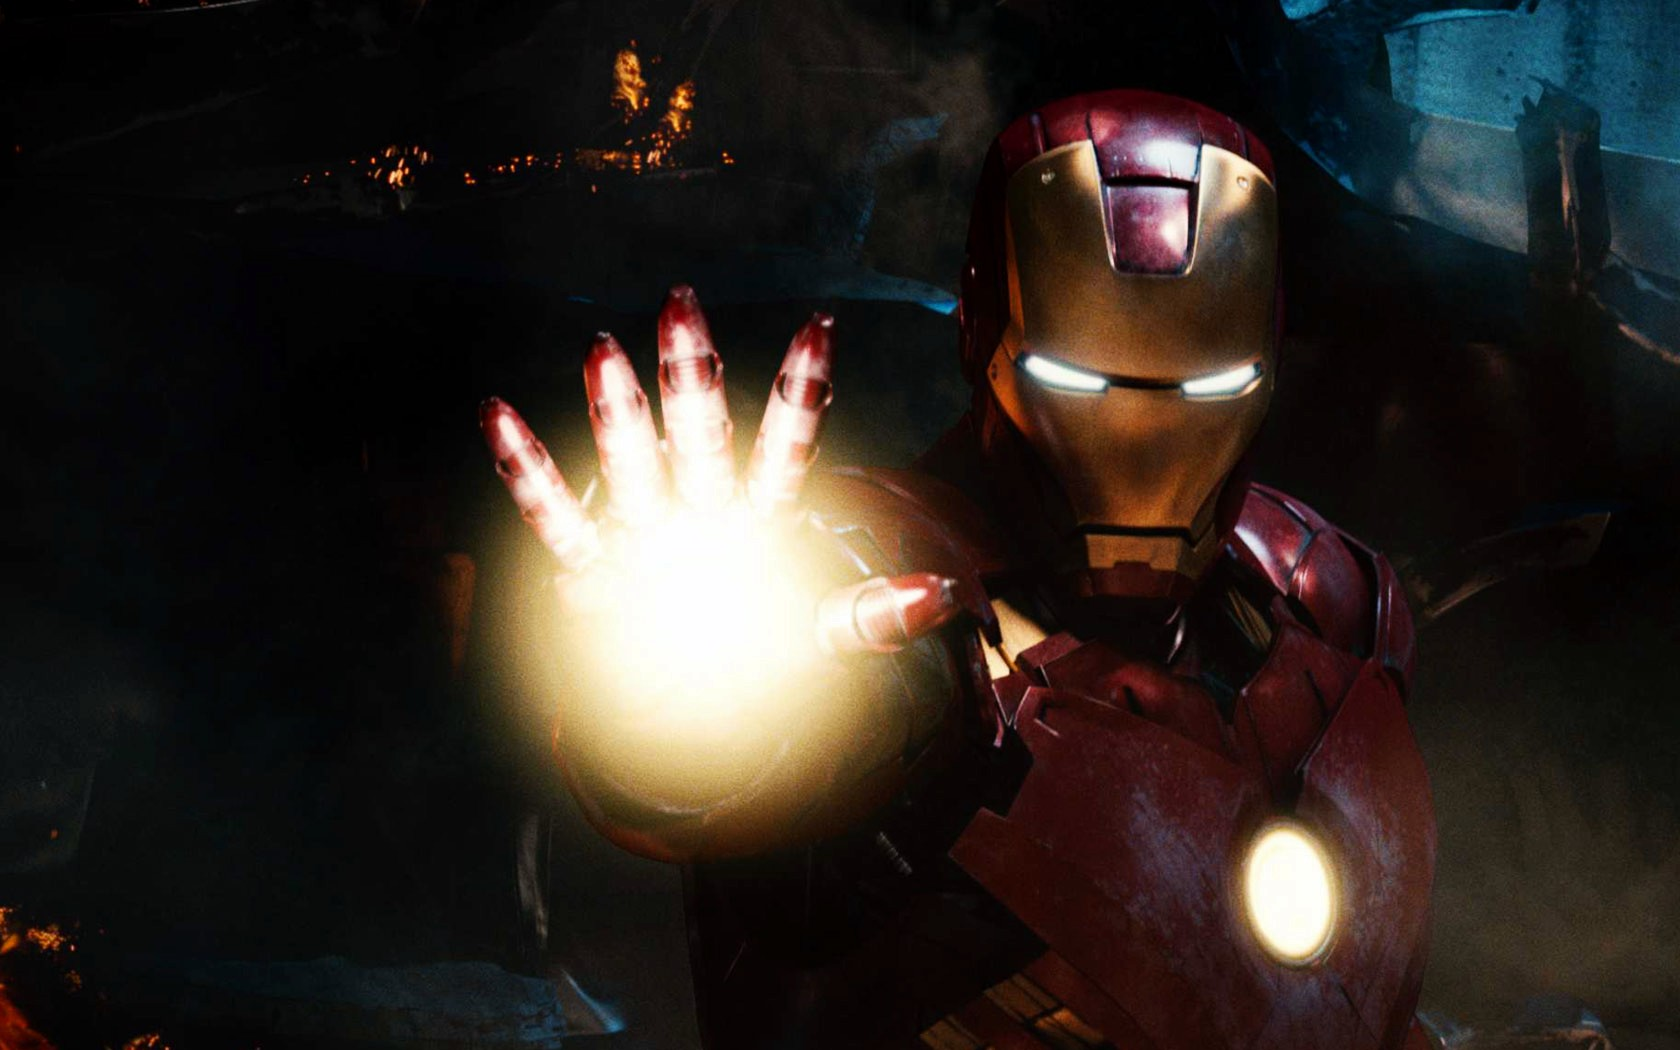 2010 Iron Man 2 Movie Still Wallpapers HD Wallpapers 1680x1050